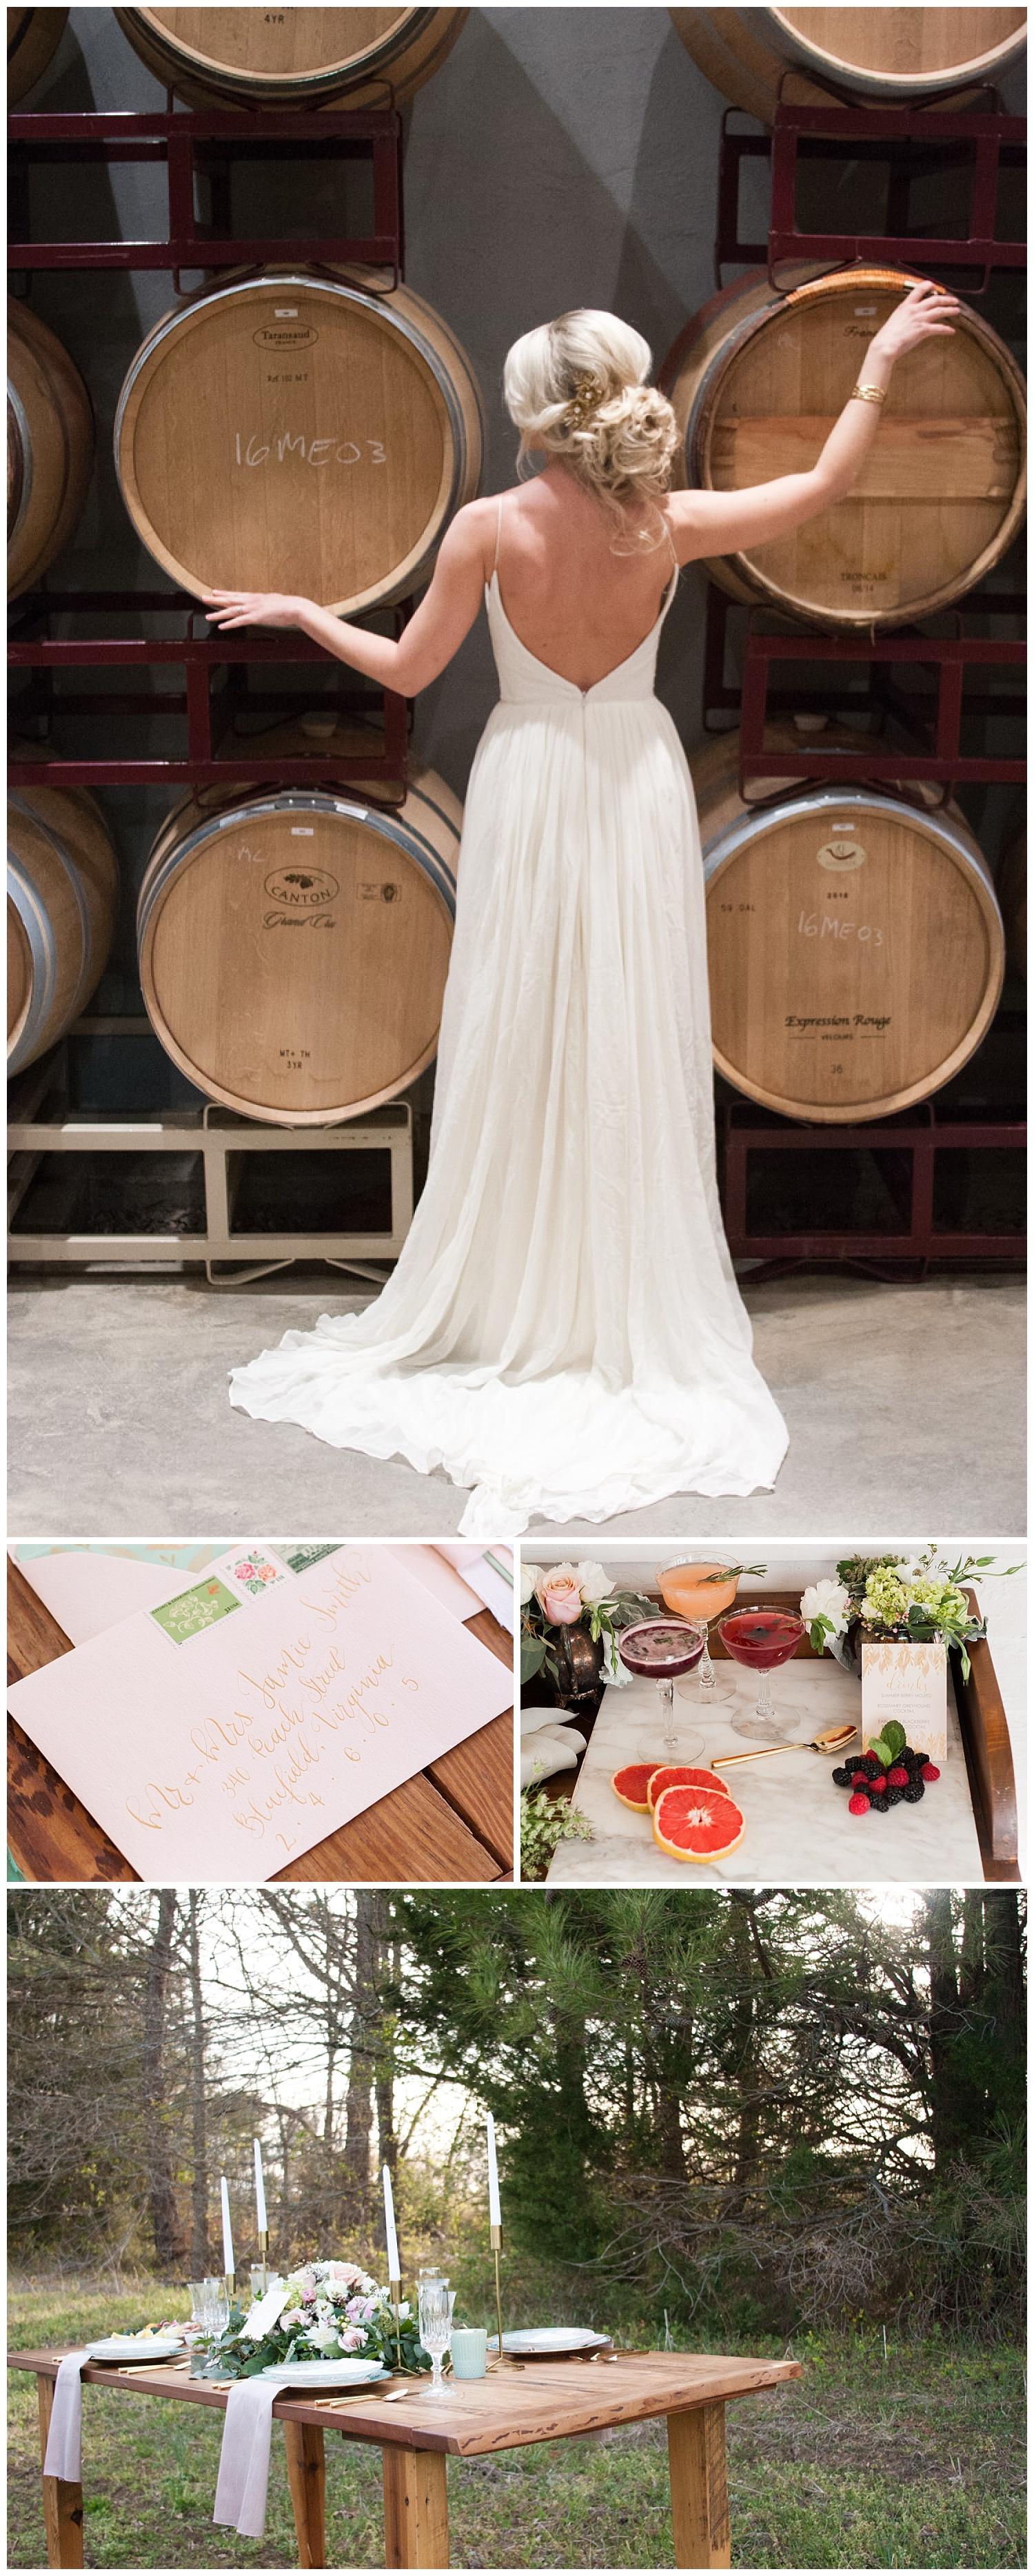 M J Mendoza Photography - Virginia Wedding & Lifestyle Photographer